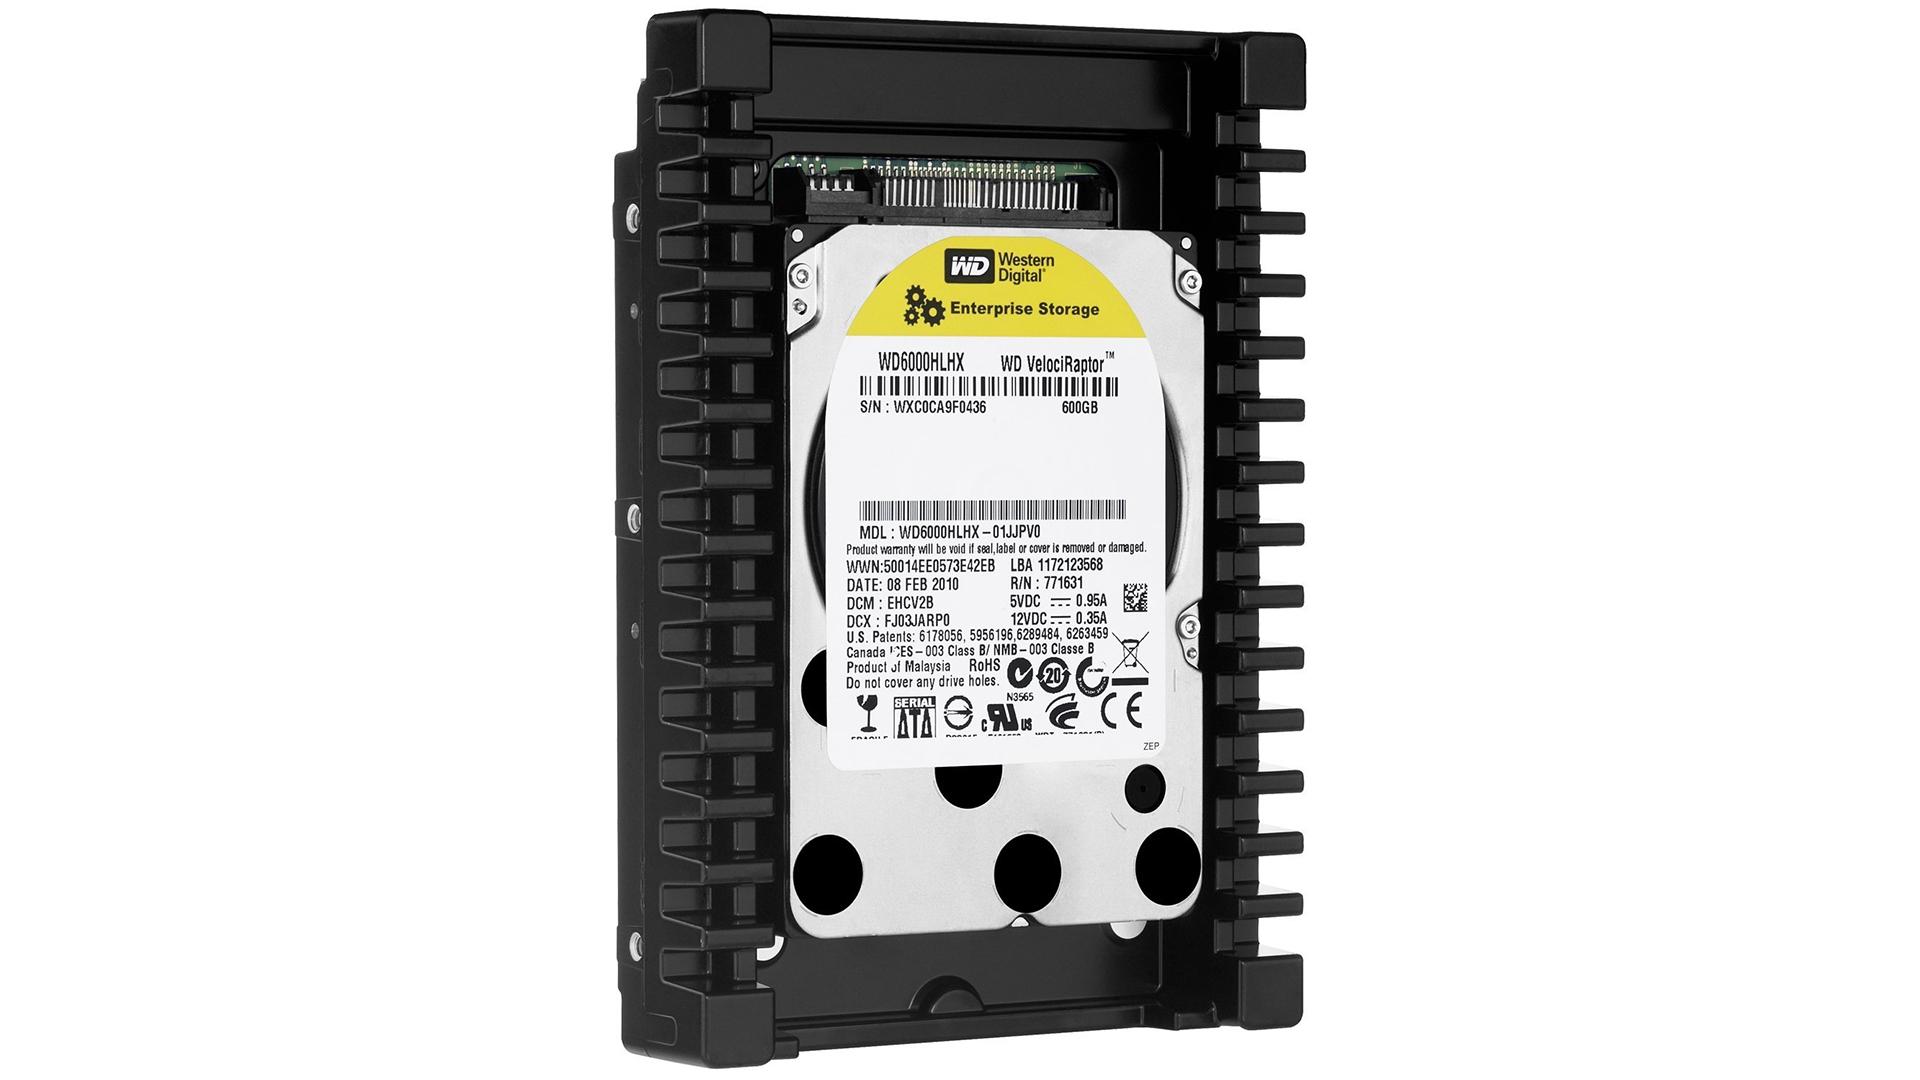 Best gaming hard drive: WD VelociRaptor